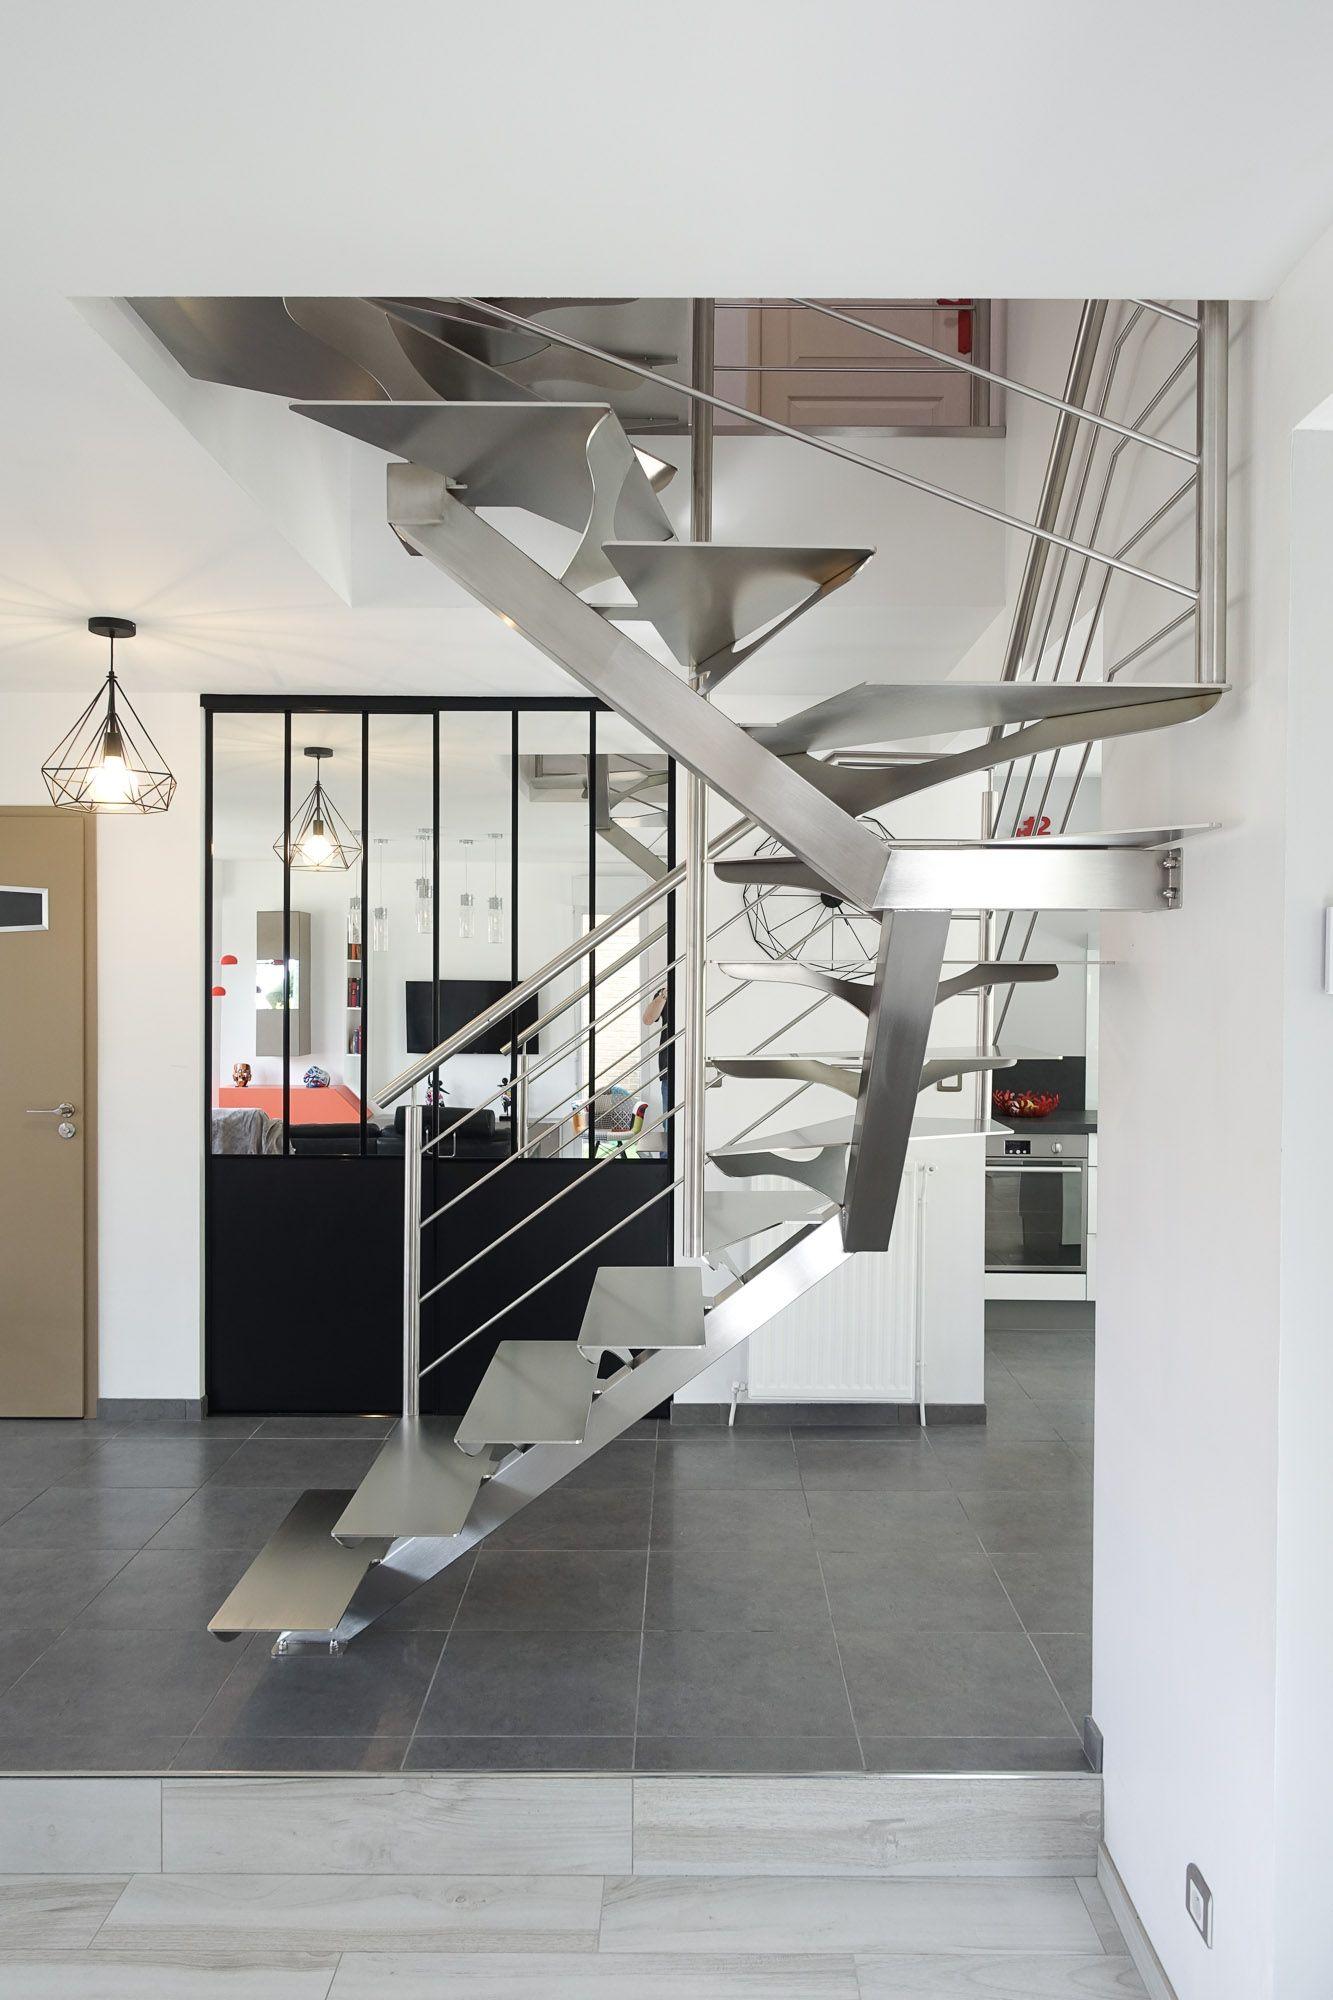 Escalier Inox Design Finistere Morbihan Bretagne En 2020 Design Finistere Morbihan